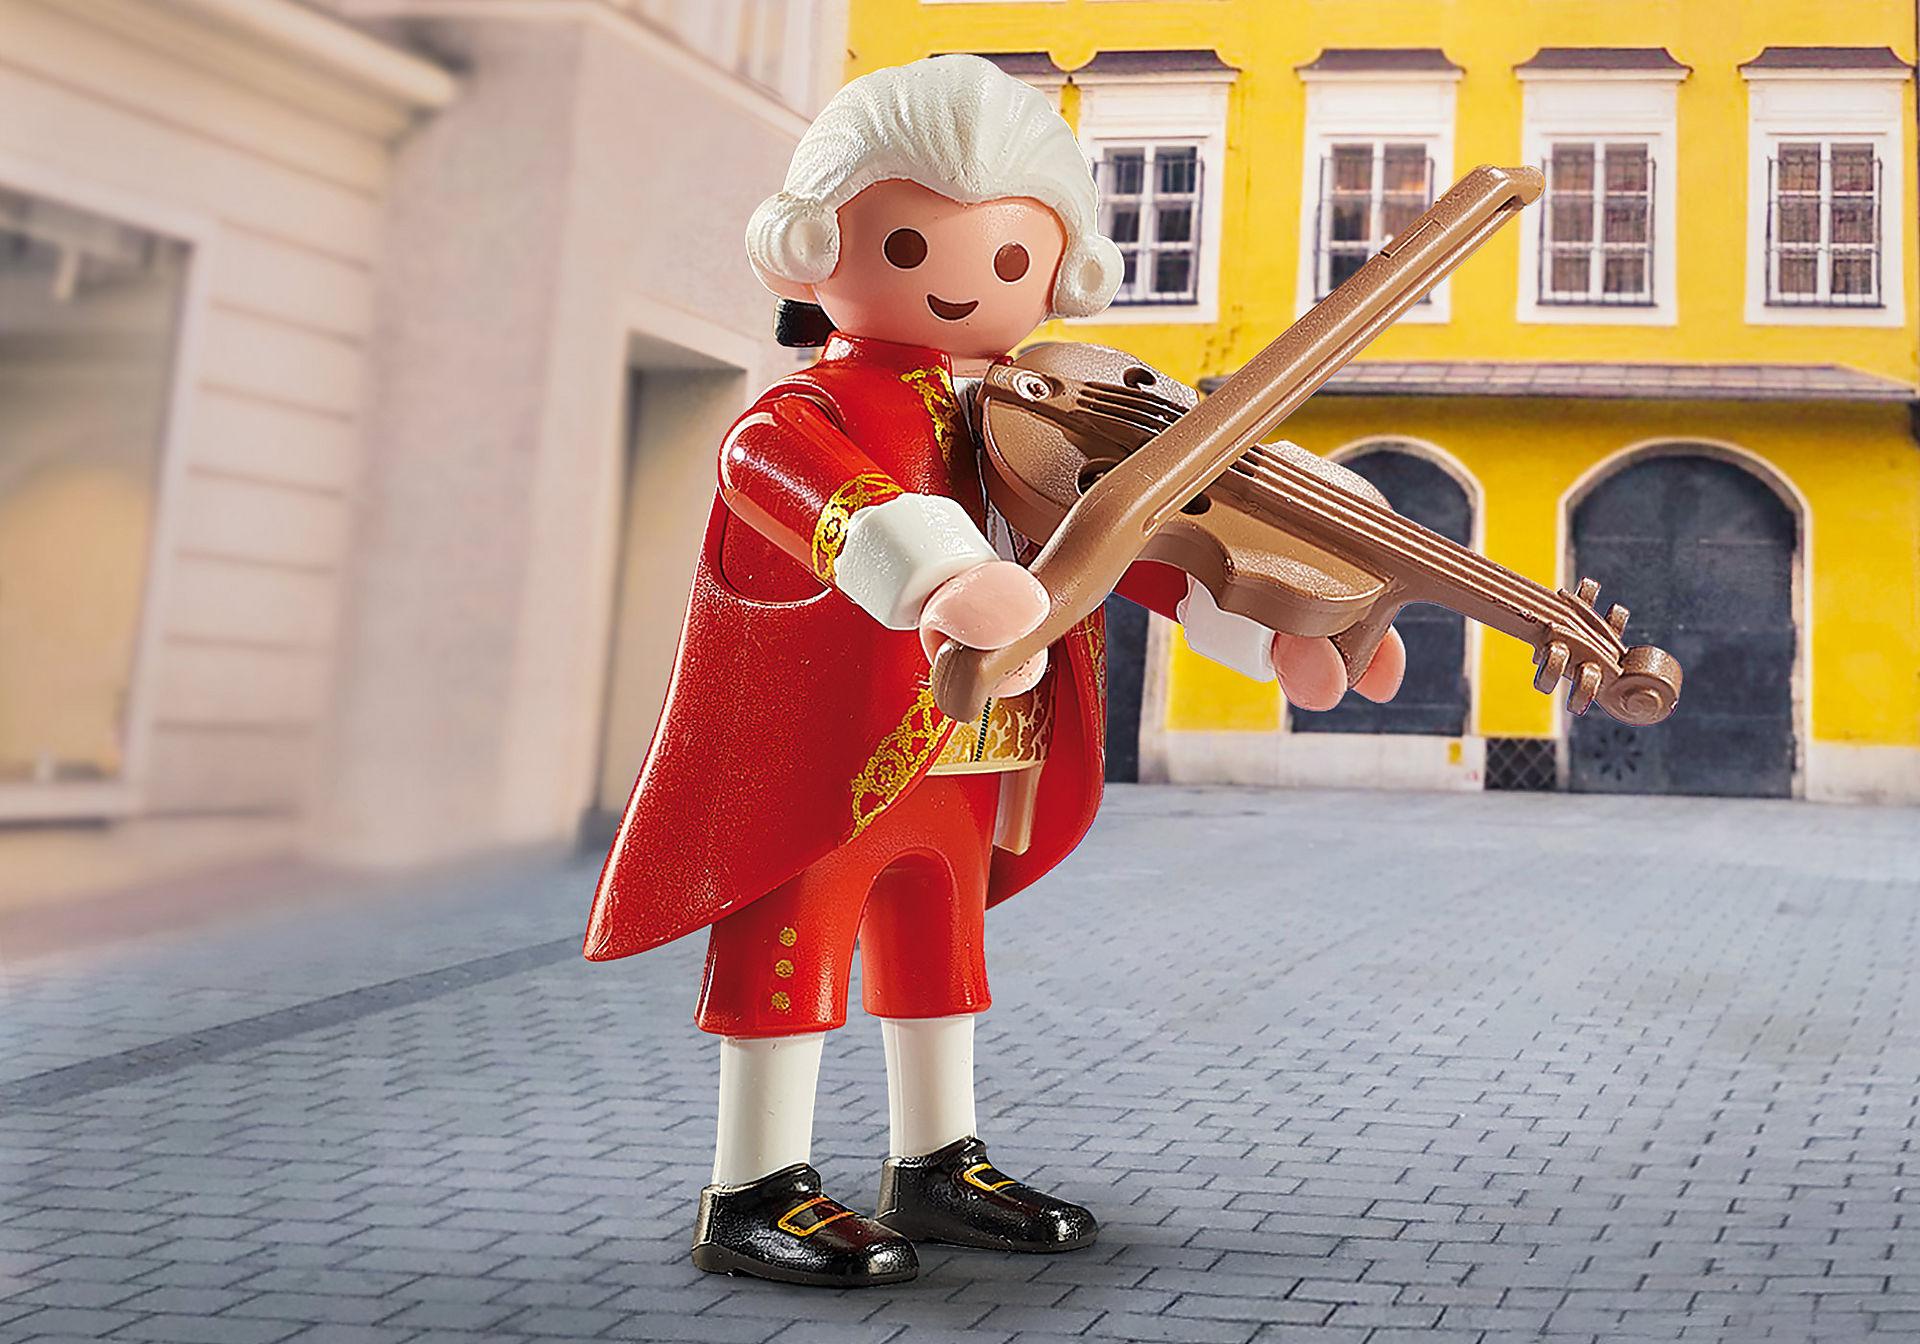 70374 Promo Mozart zoom image1